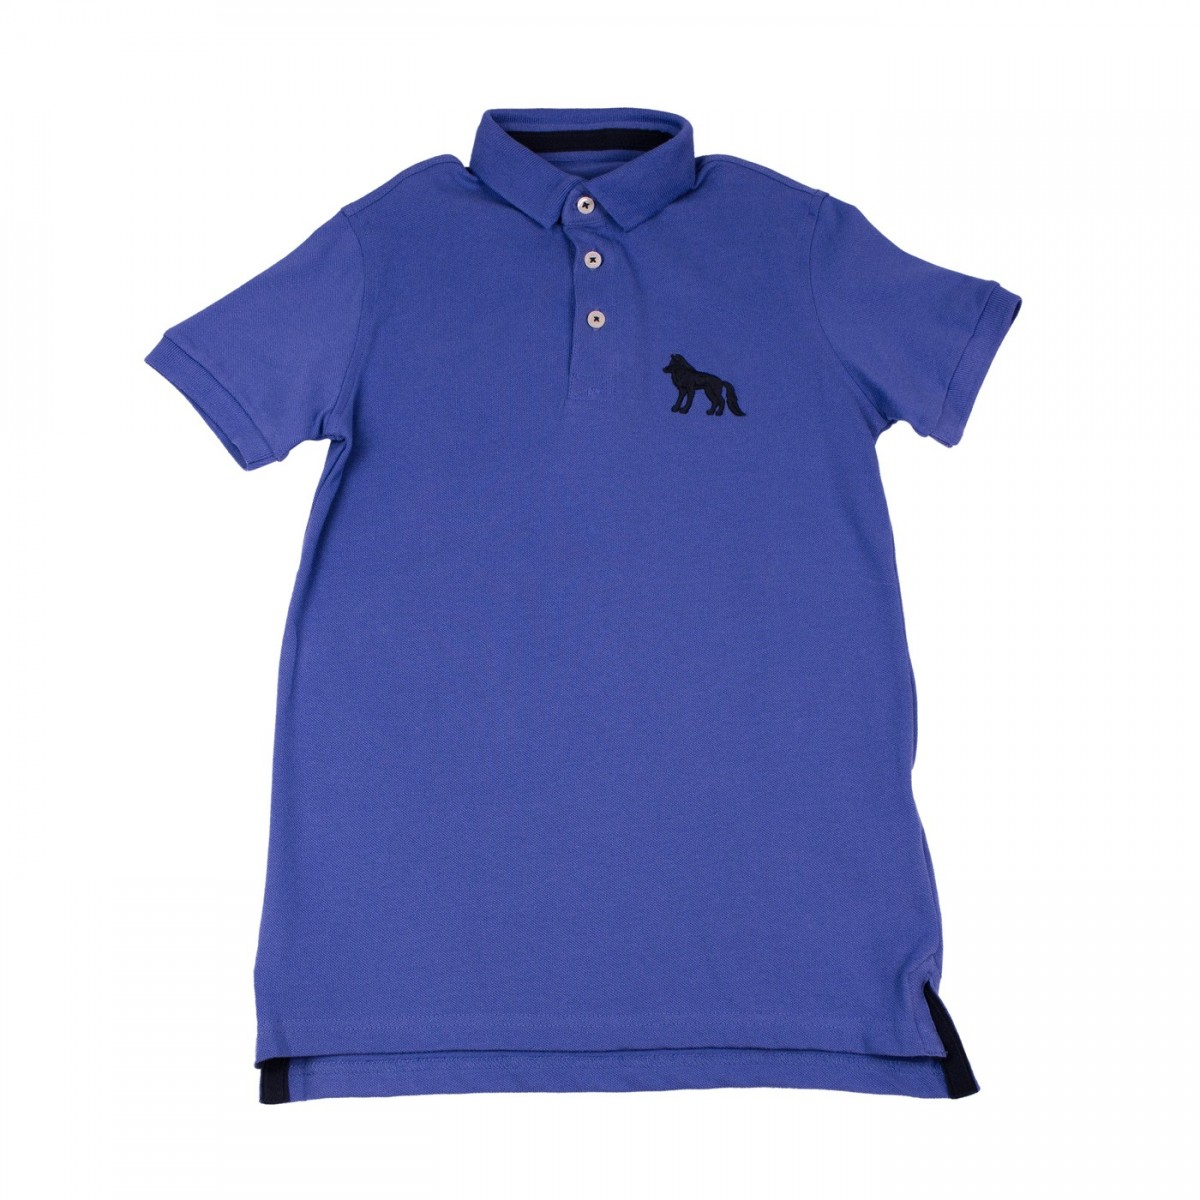 a01e0cd2d Bizz Store - Camisa Polo Infantil Masculina Acostamento Azul